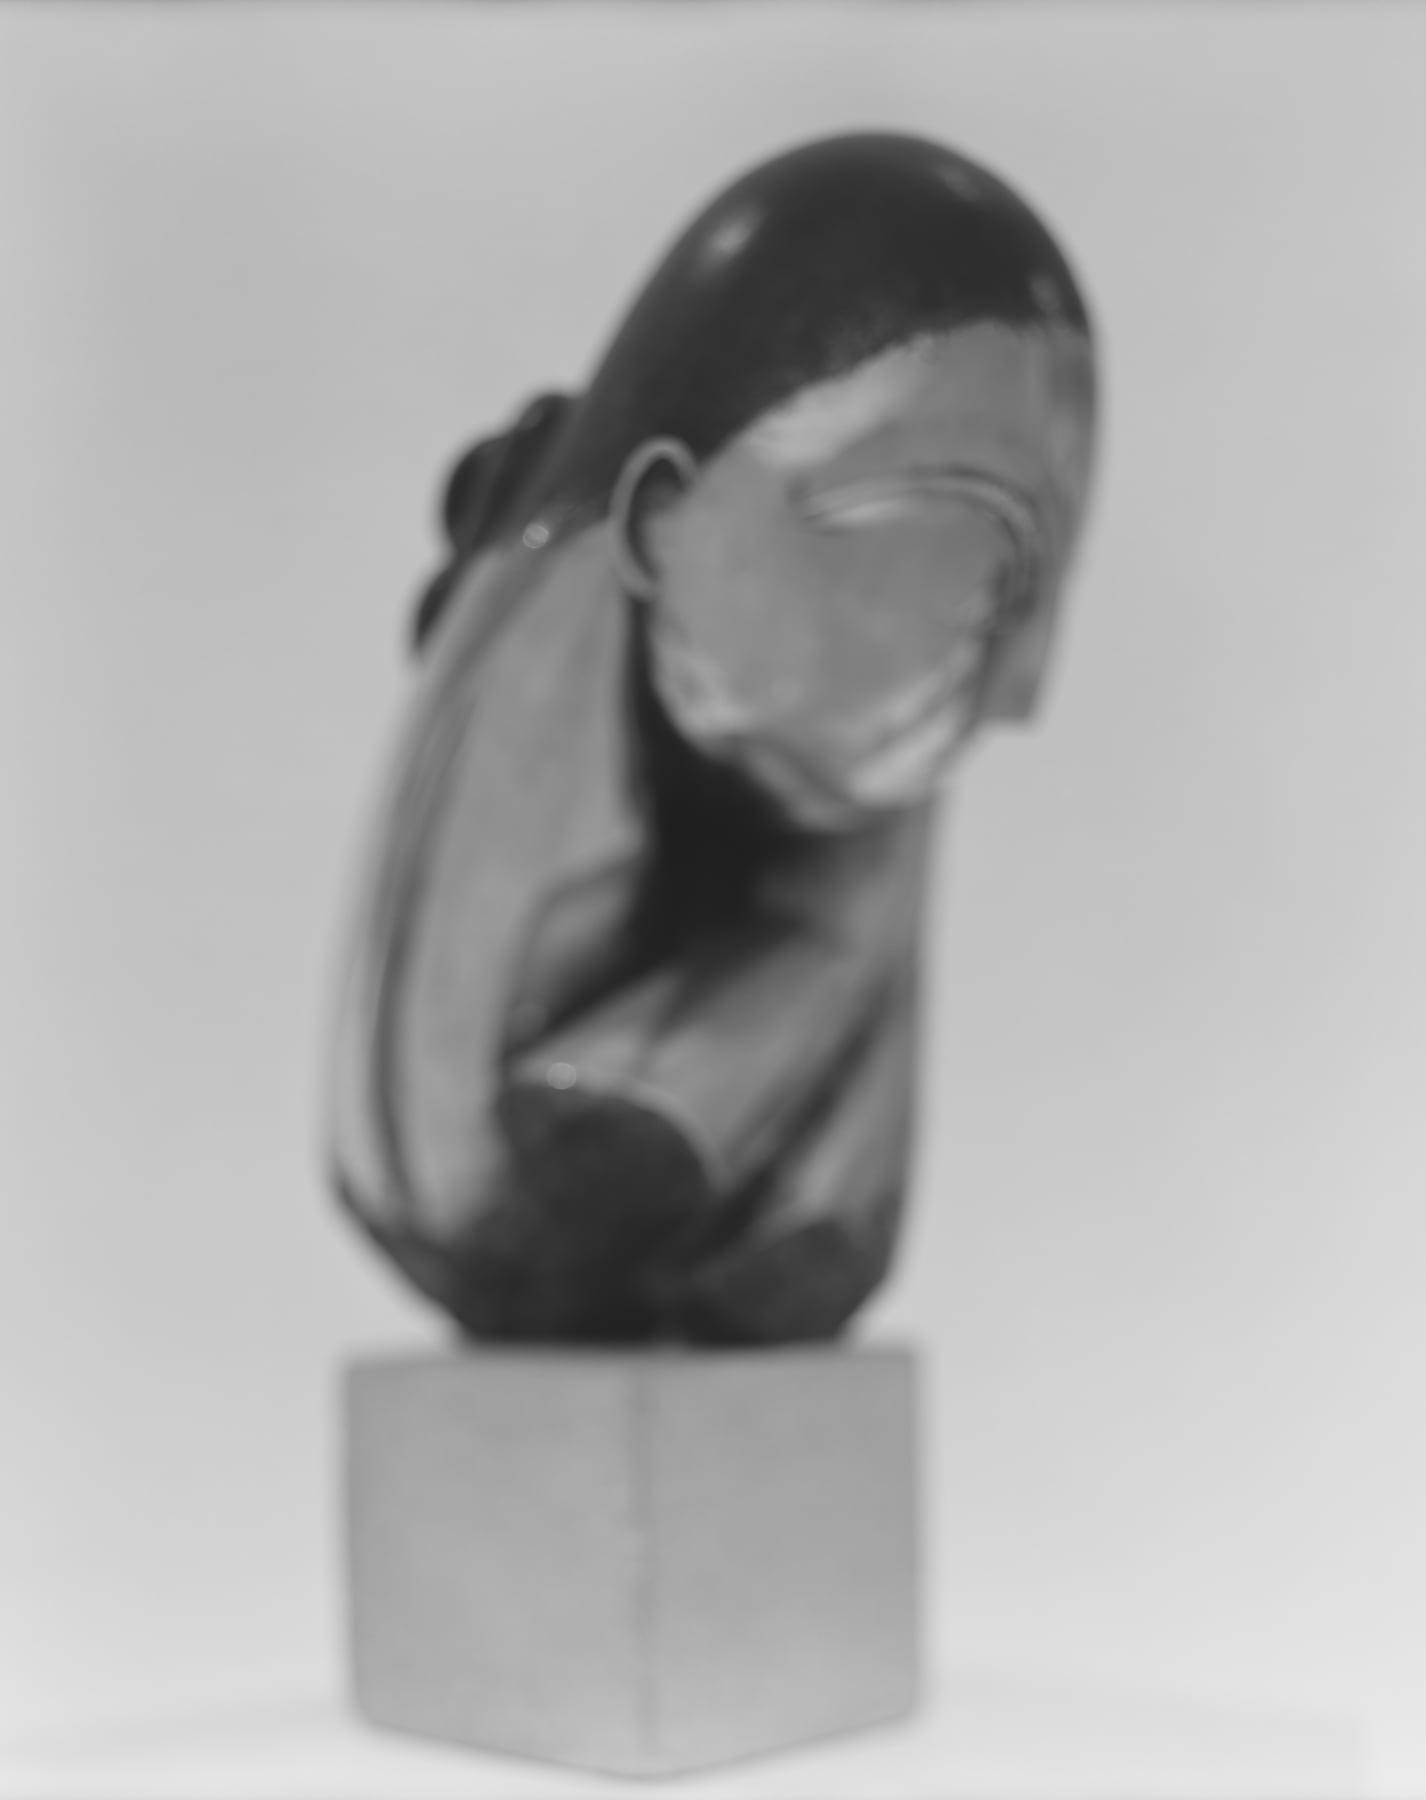 Hiroshi Sugimoto, Past Presence 030, Mlle Pogany, Constantin Brancusi, 2014